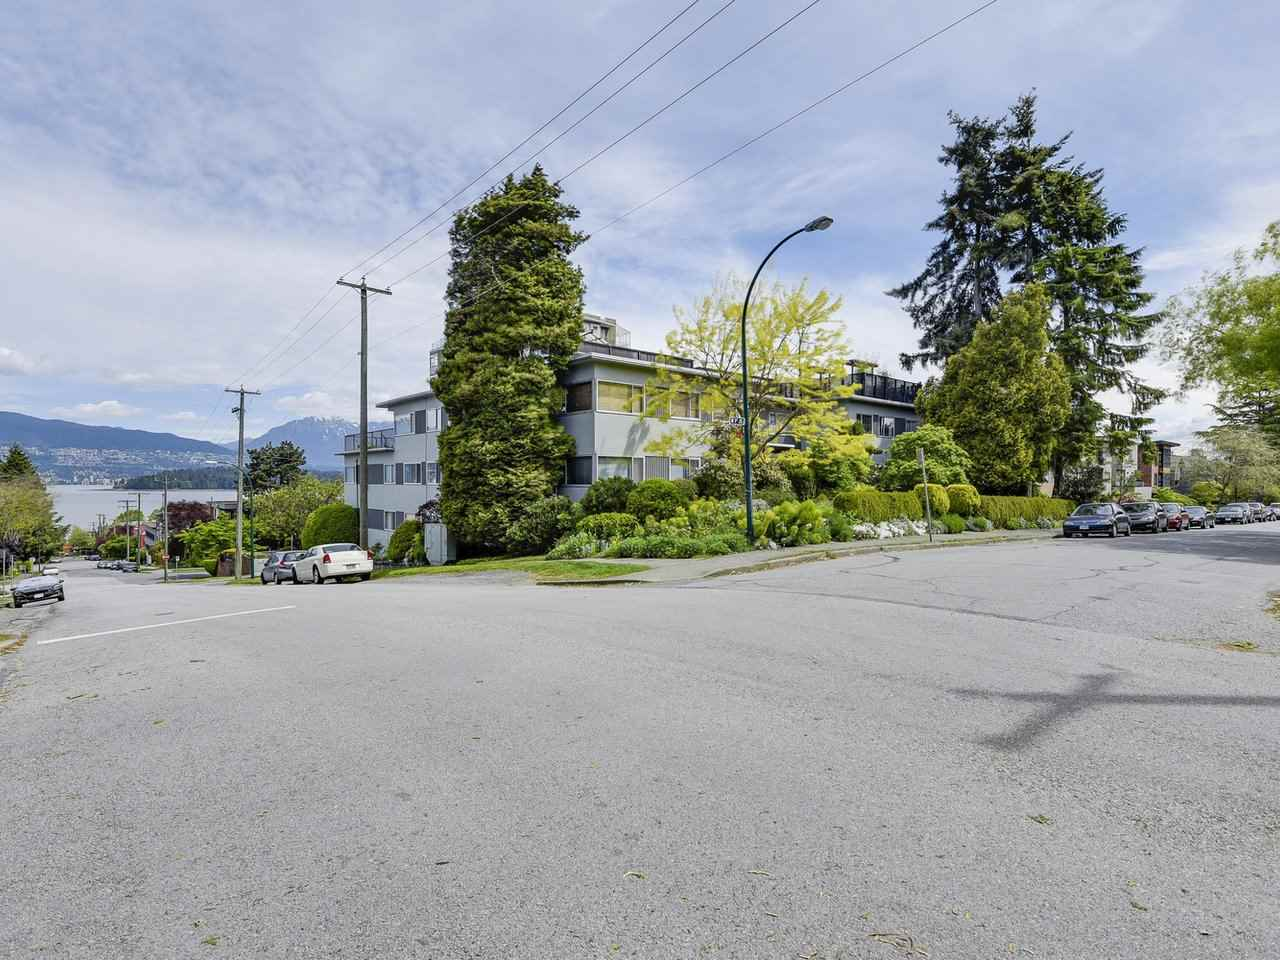 204 2493 W 1ST AVENUE, Vancouver, BC, V6K 1G5 Primary Photo